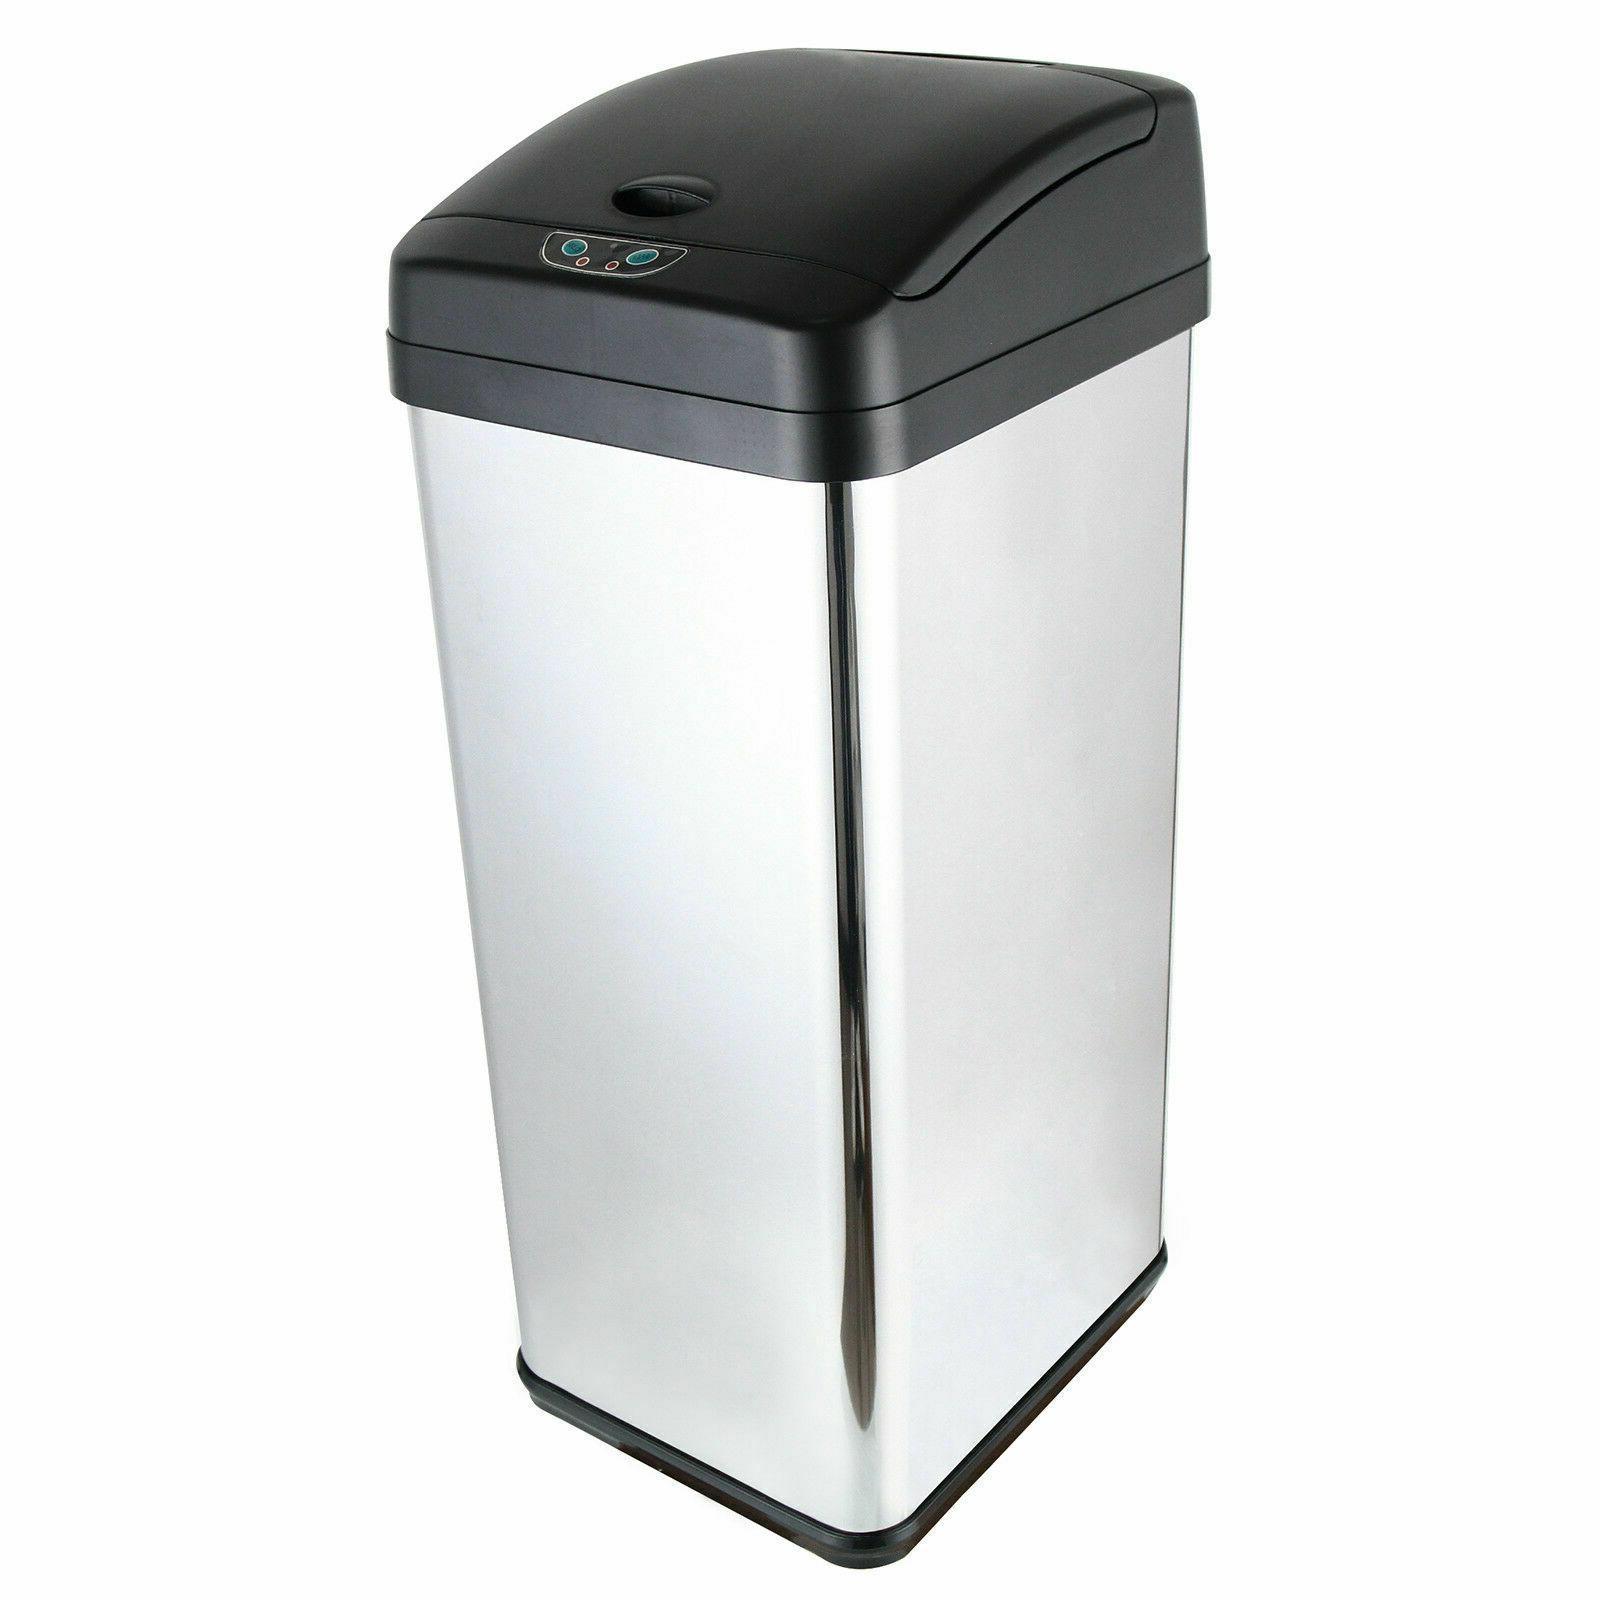 Tall 13 Gallon Large Bin Waste